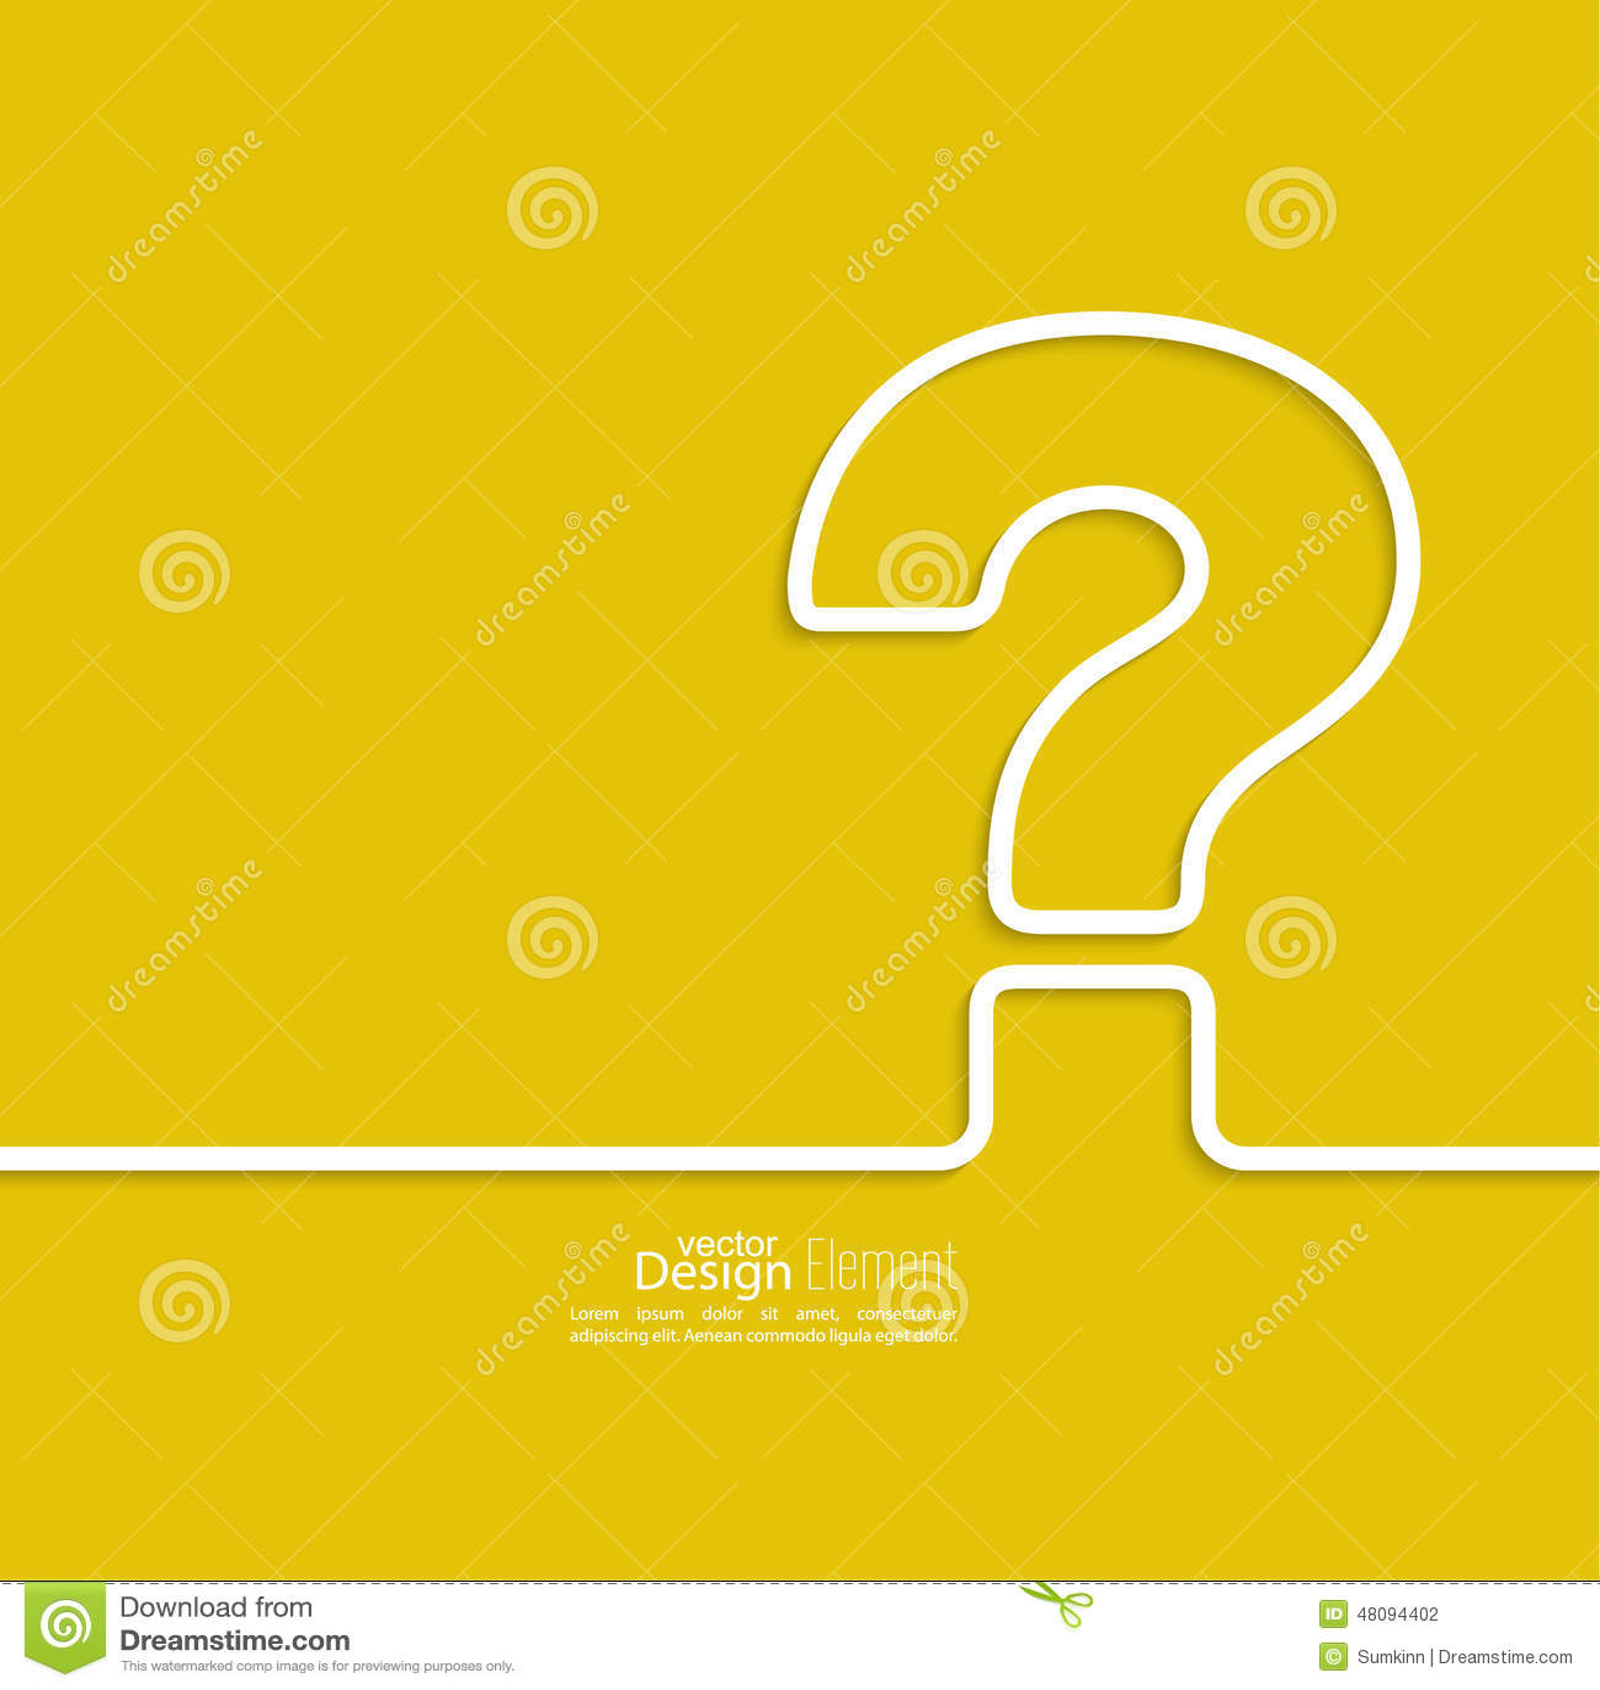 question mark icon stock vector image 48094402